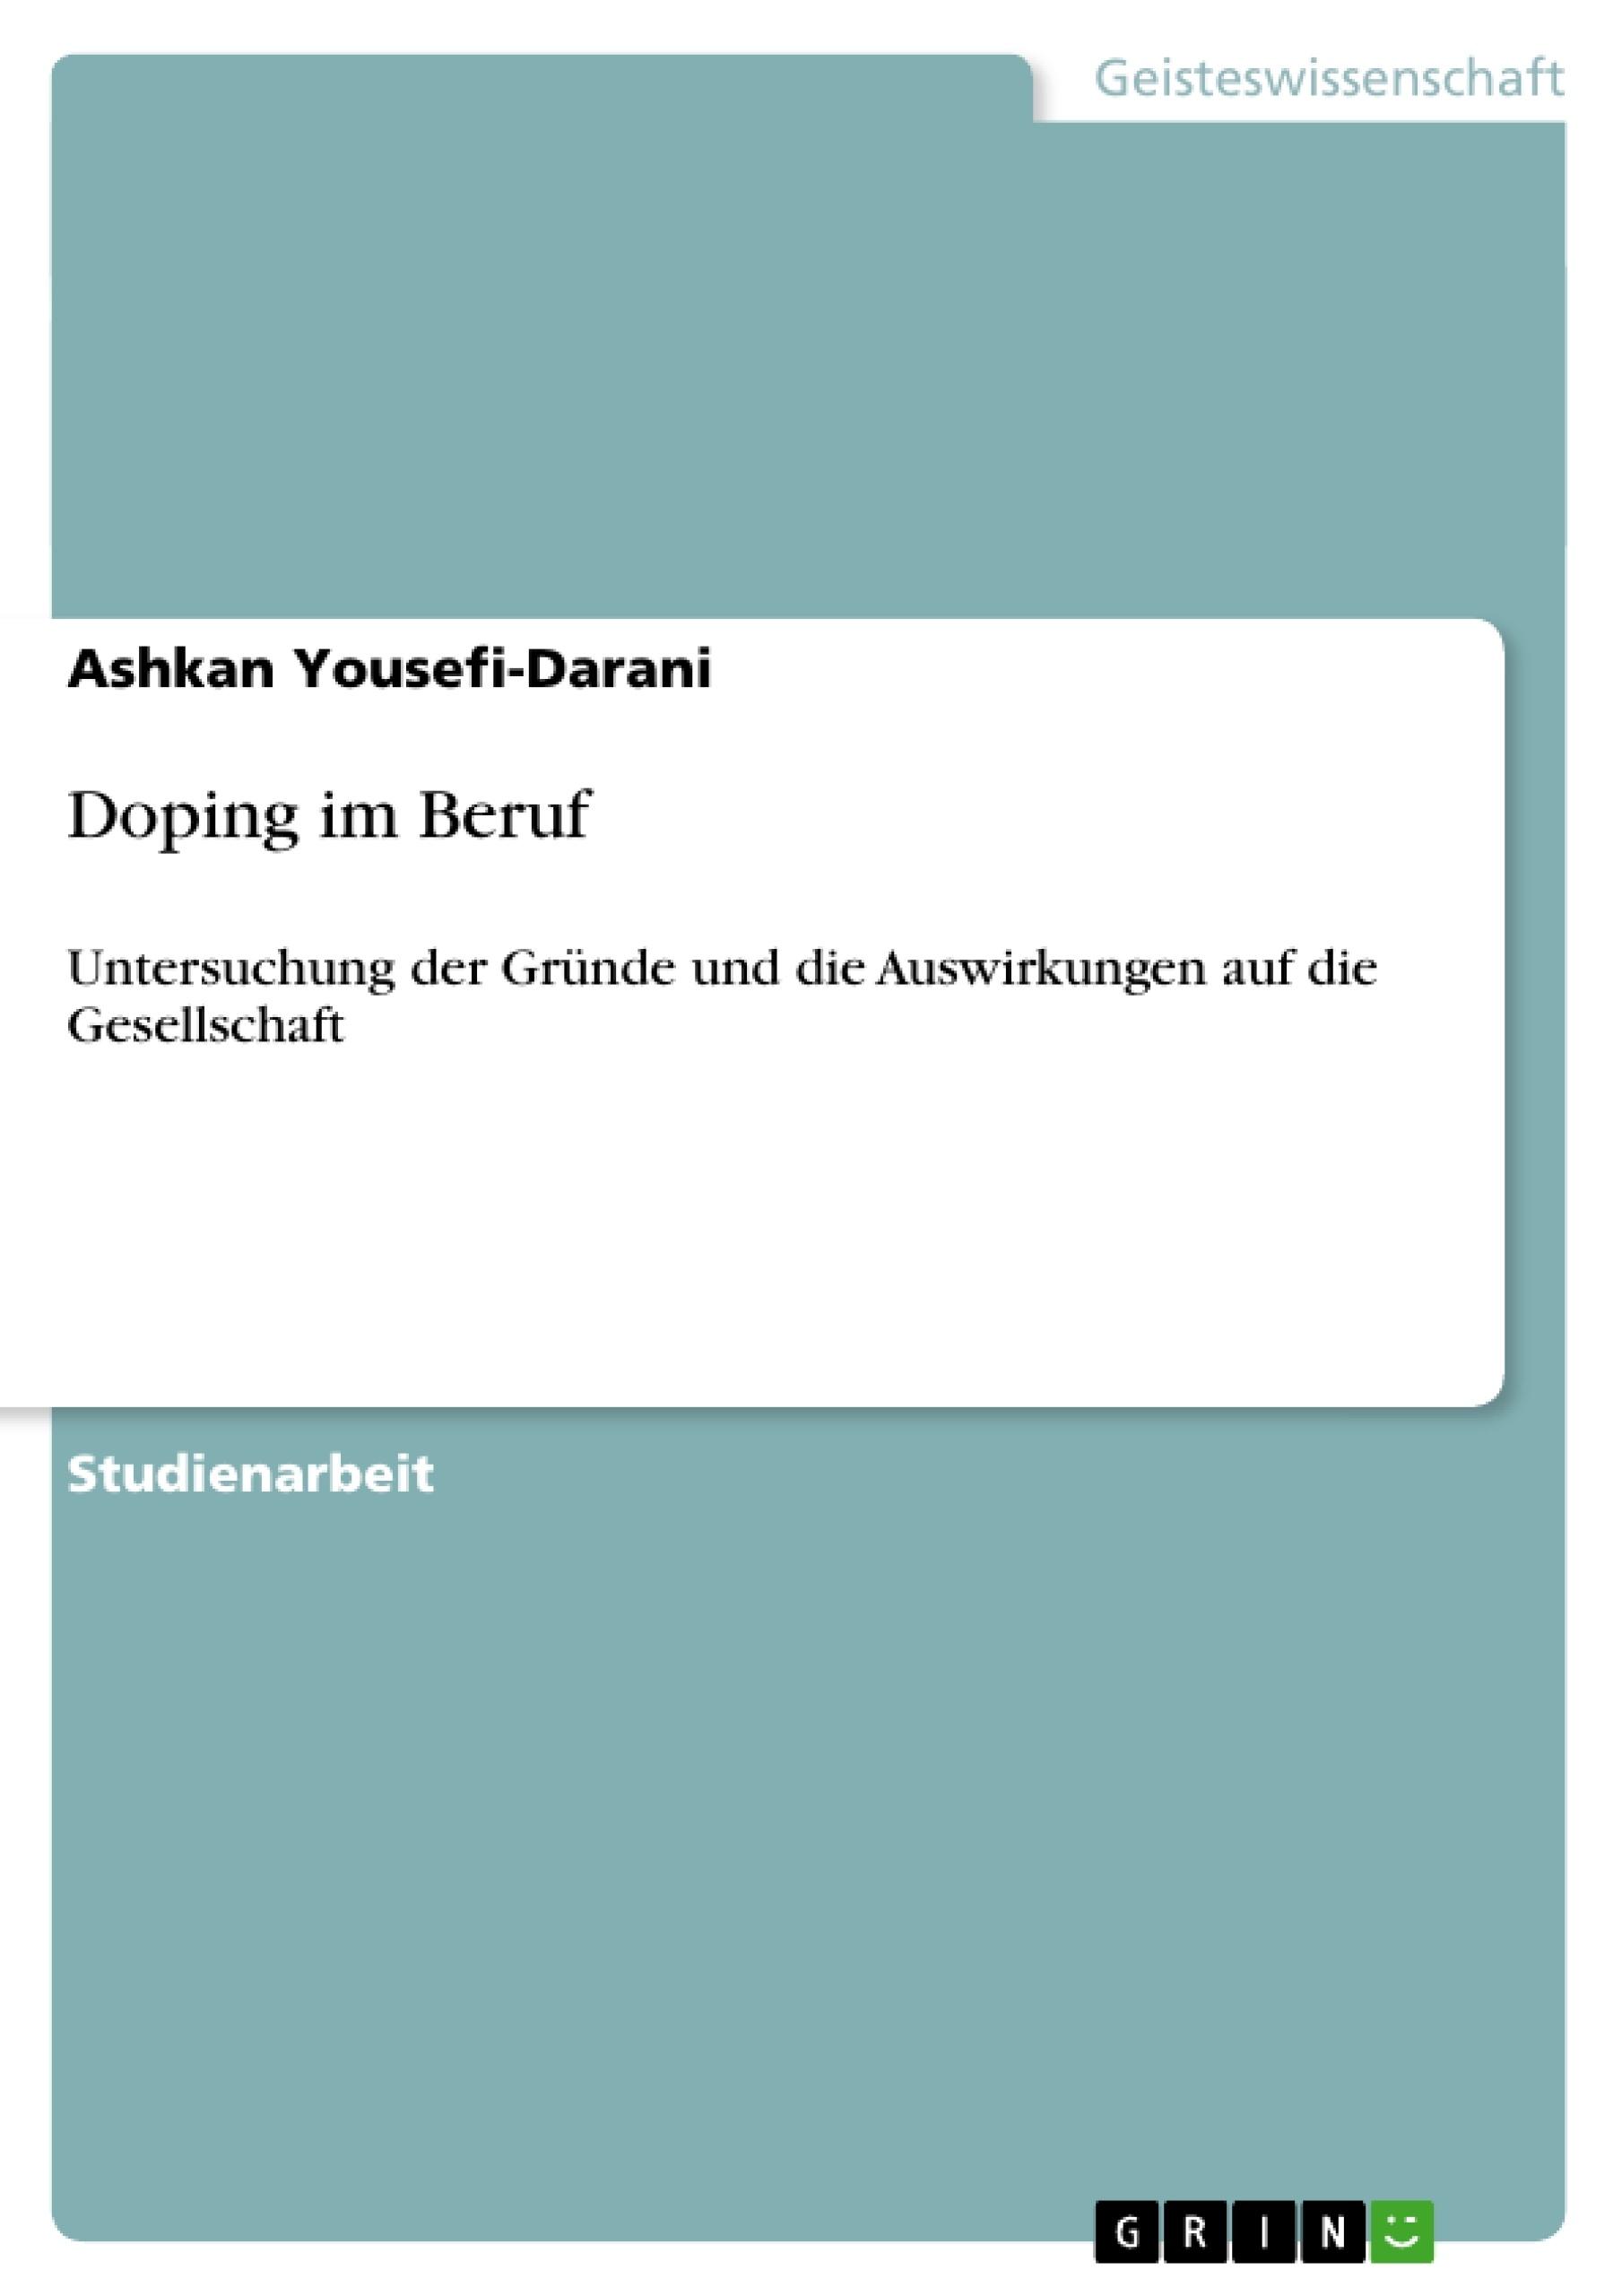 Titel: Doping im Beruf